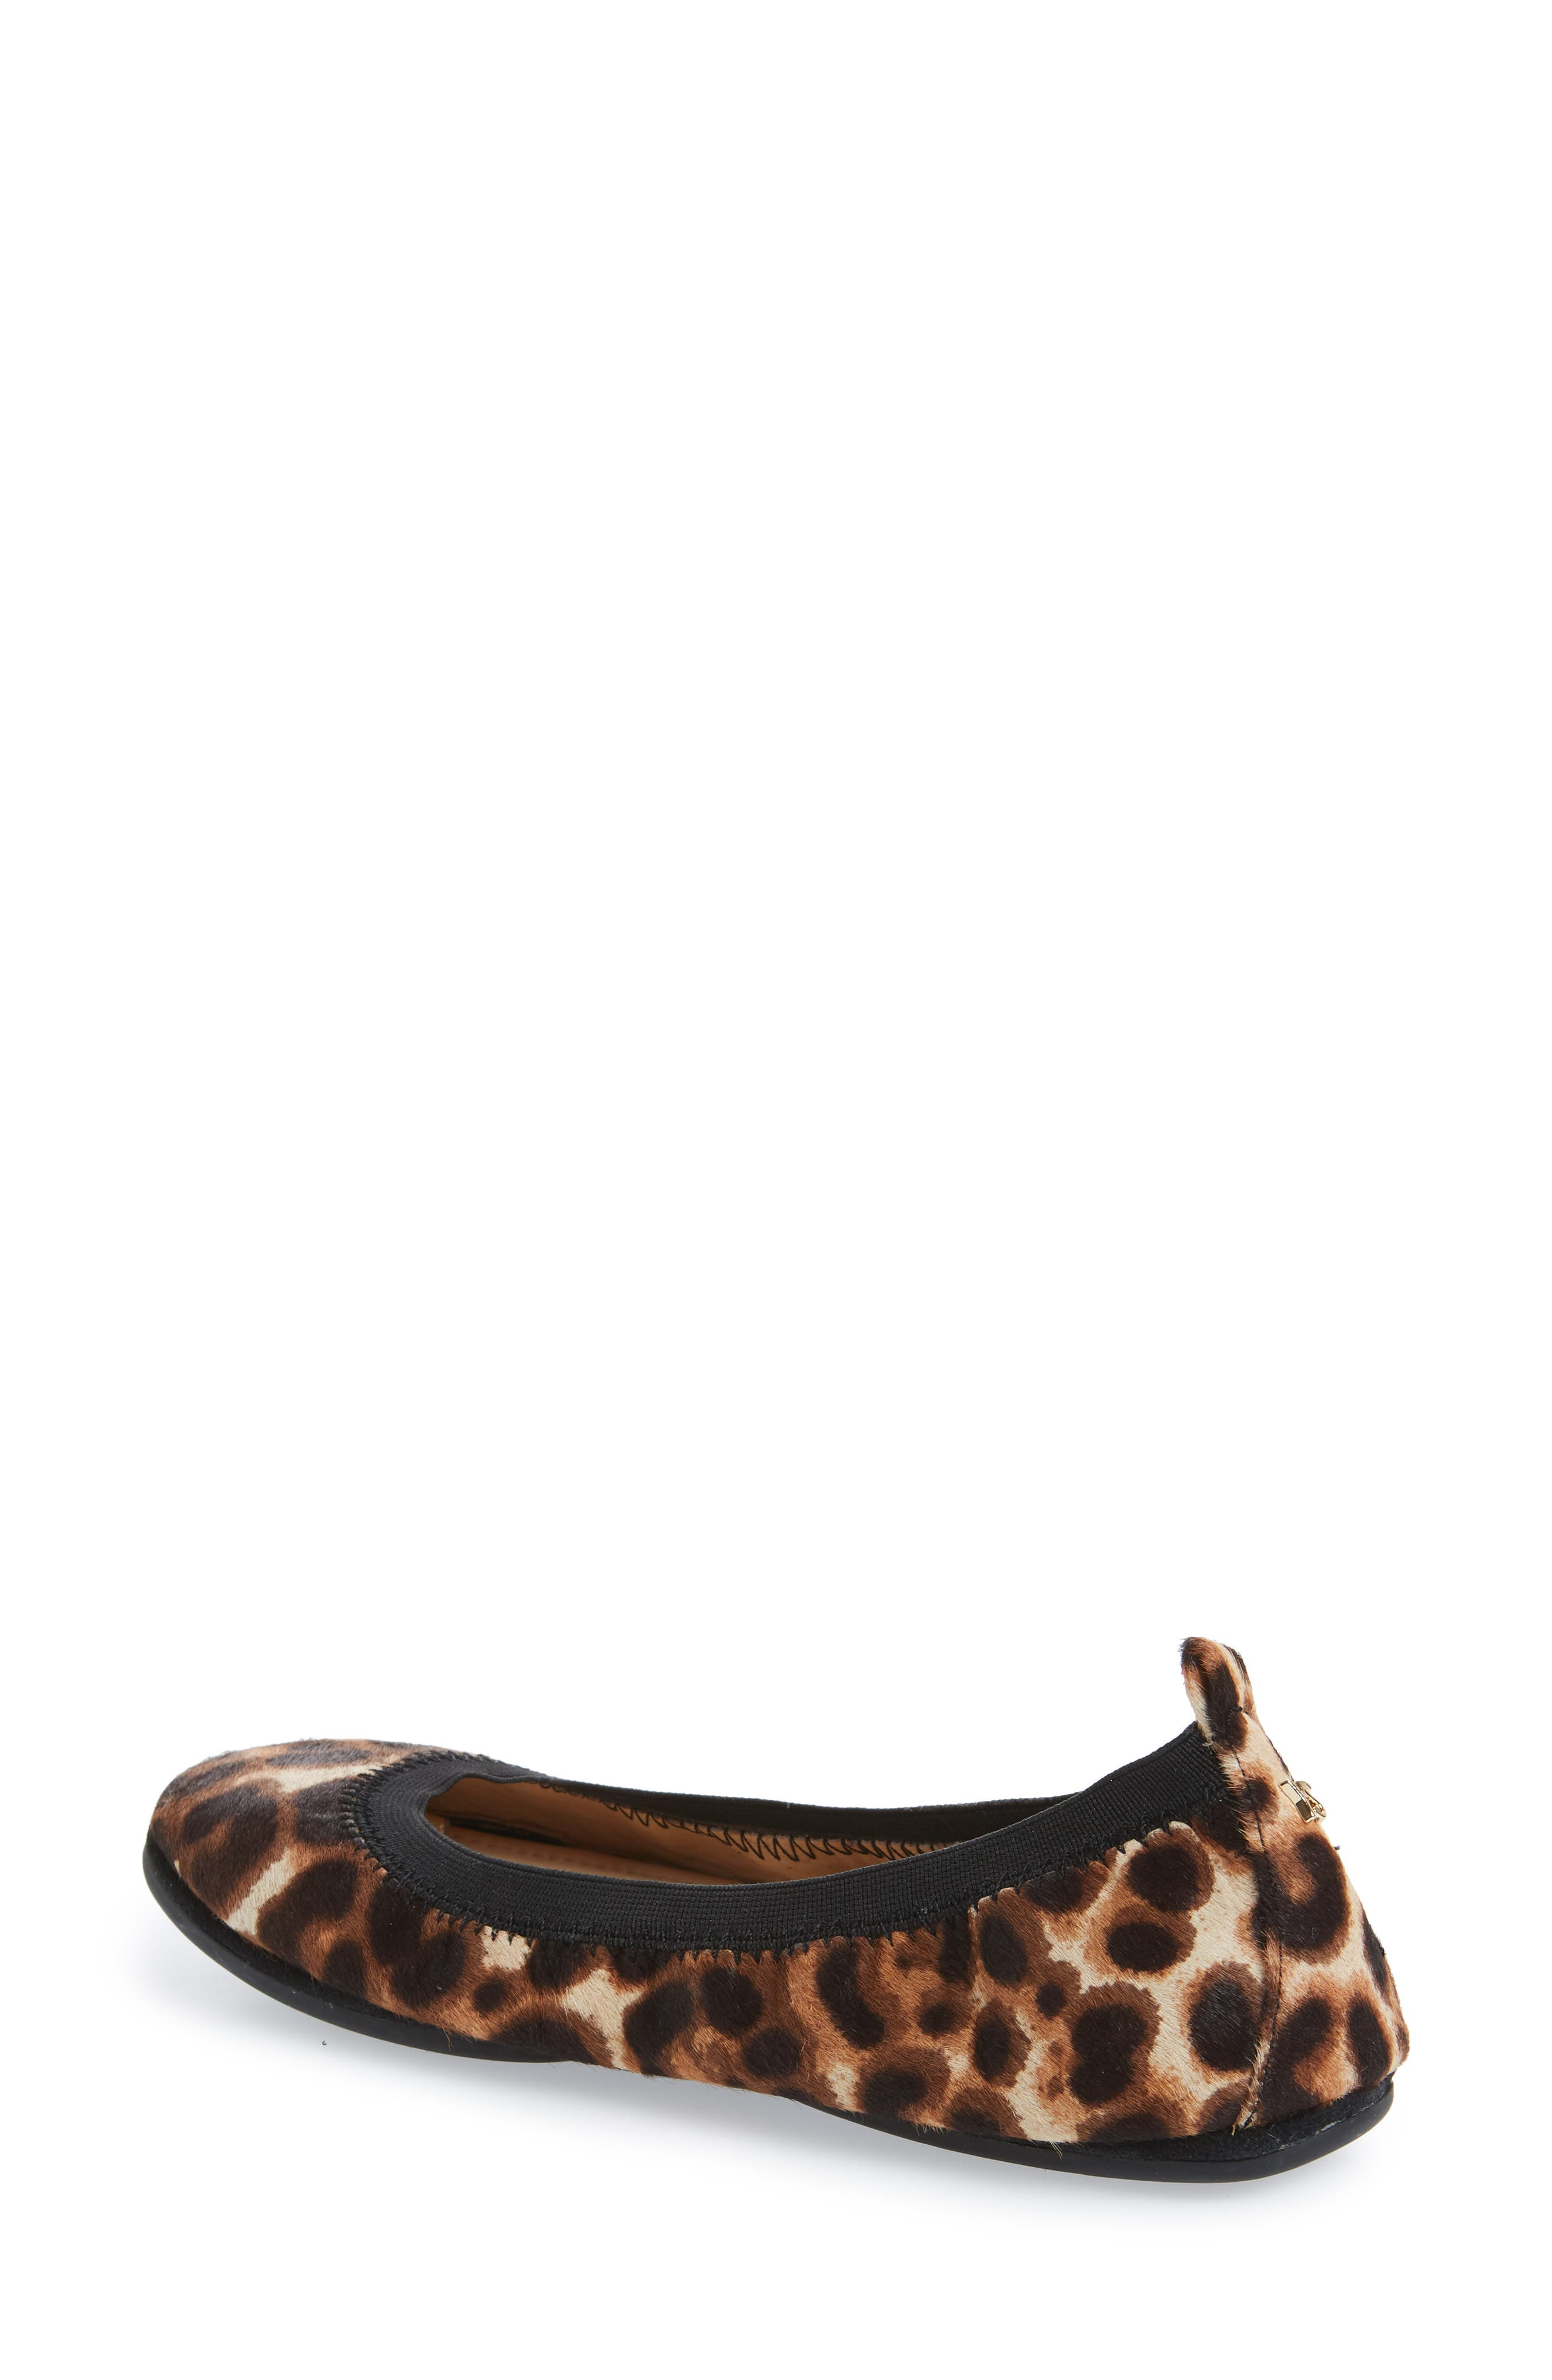 Samara Foldable Ballet Flat,                             Alternate thumbnail 2, color,                             Natural Leopard Calf Hair